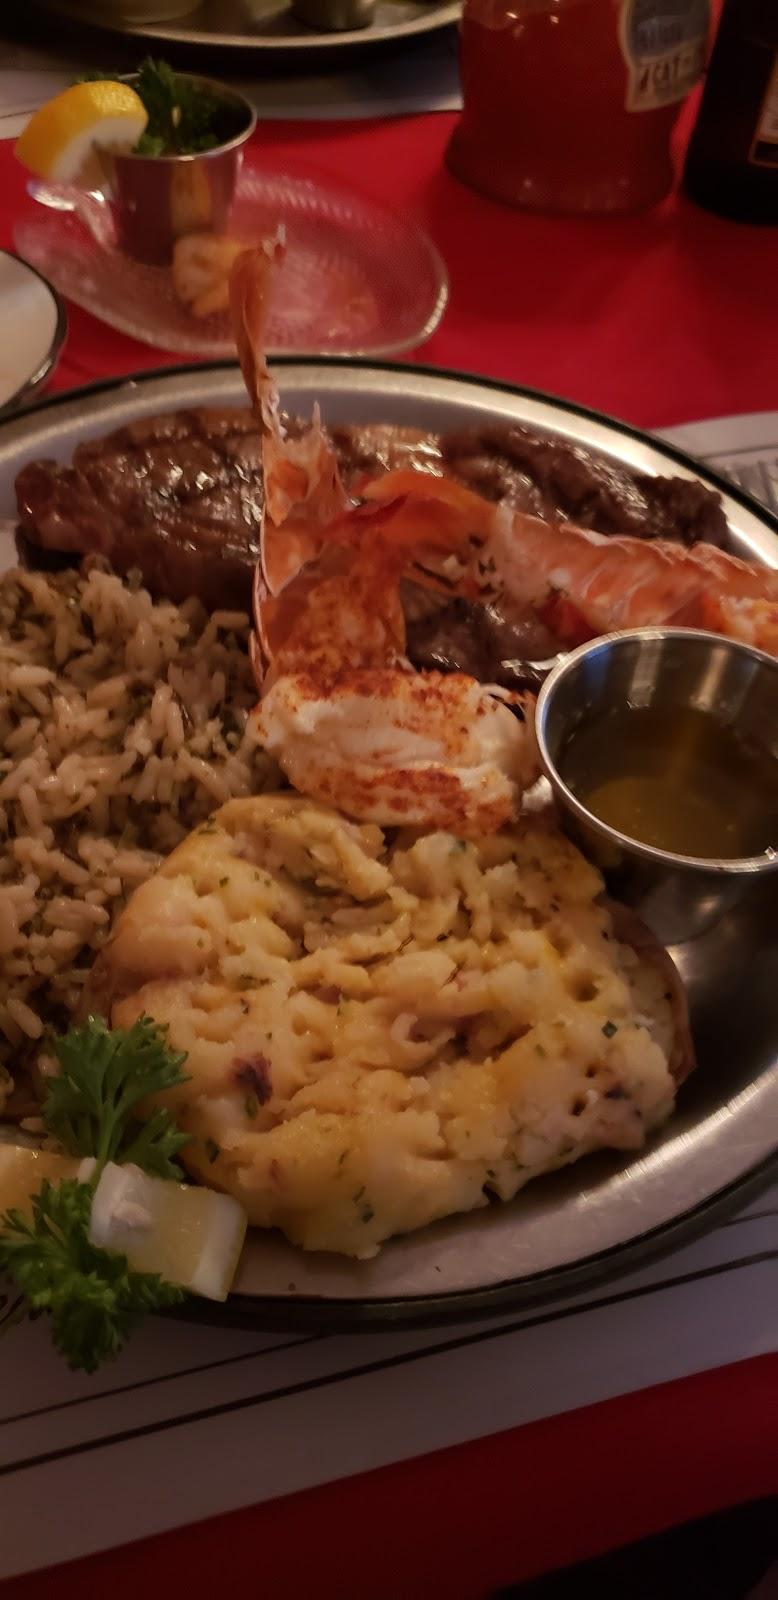 Cat & Owl Steak & Seafood   restaurant   110 Karnes Rd, Covington, VA 24426, USA   5408625808 OR +1 540-862-5808